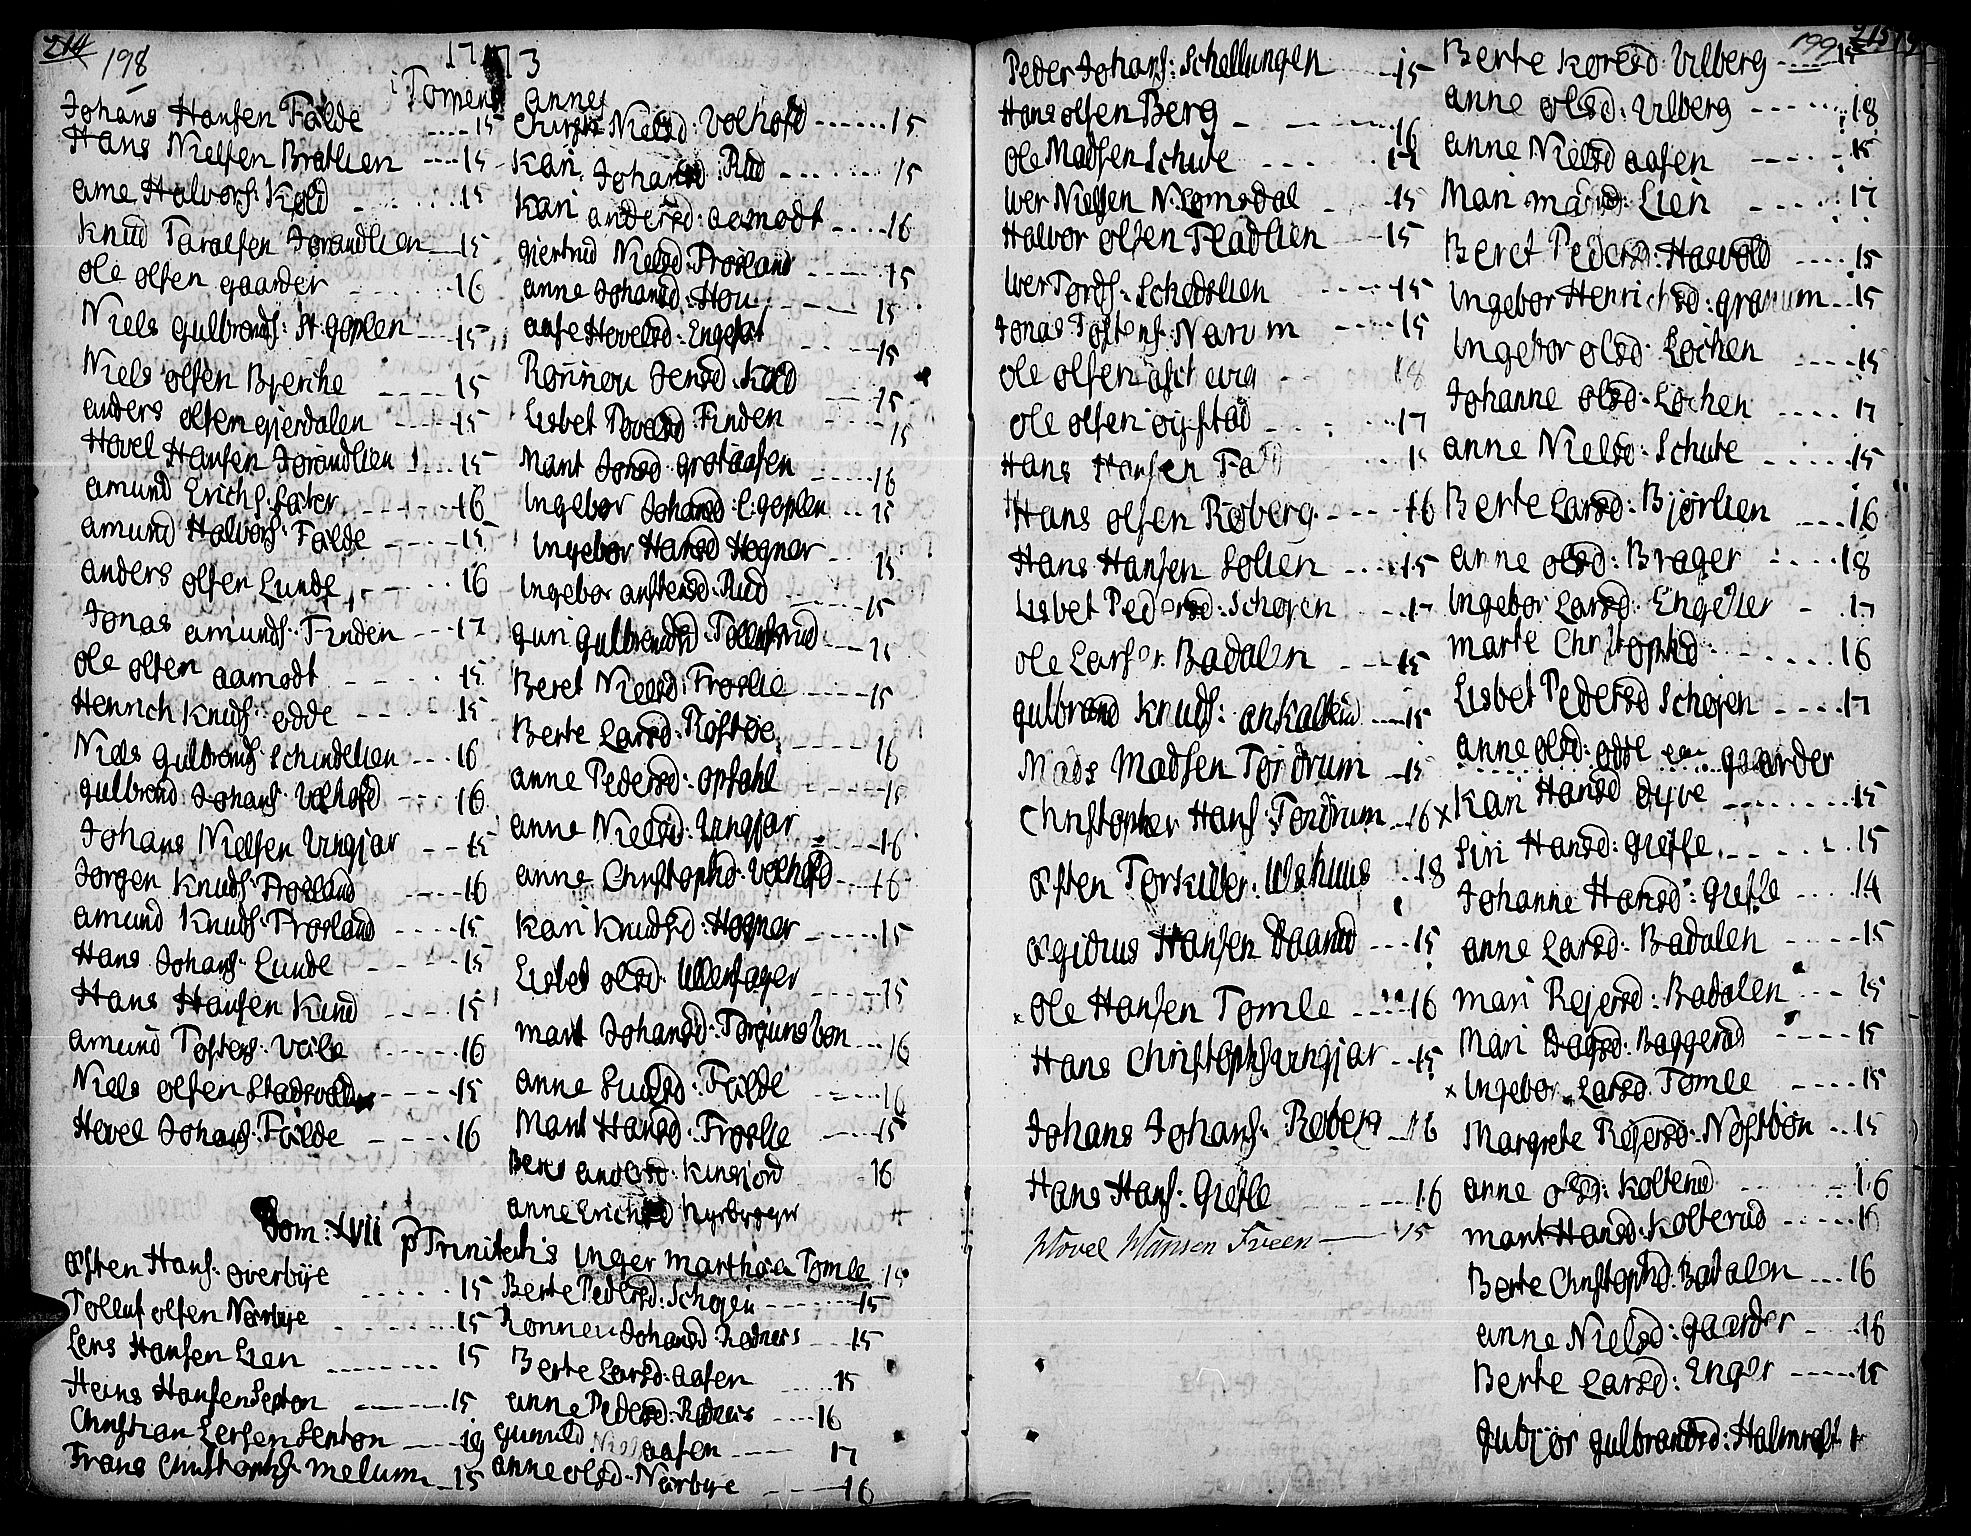 SAH, Land prestekontor, Ministerialbok nr. 5, 1765-1784, s. 198-199